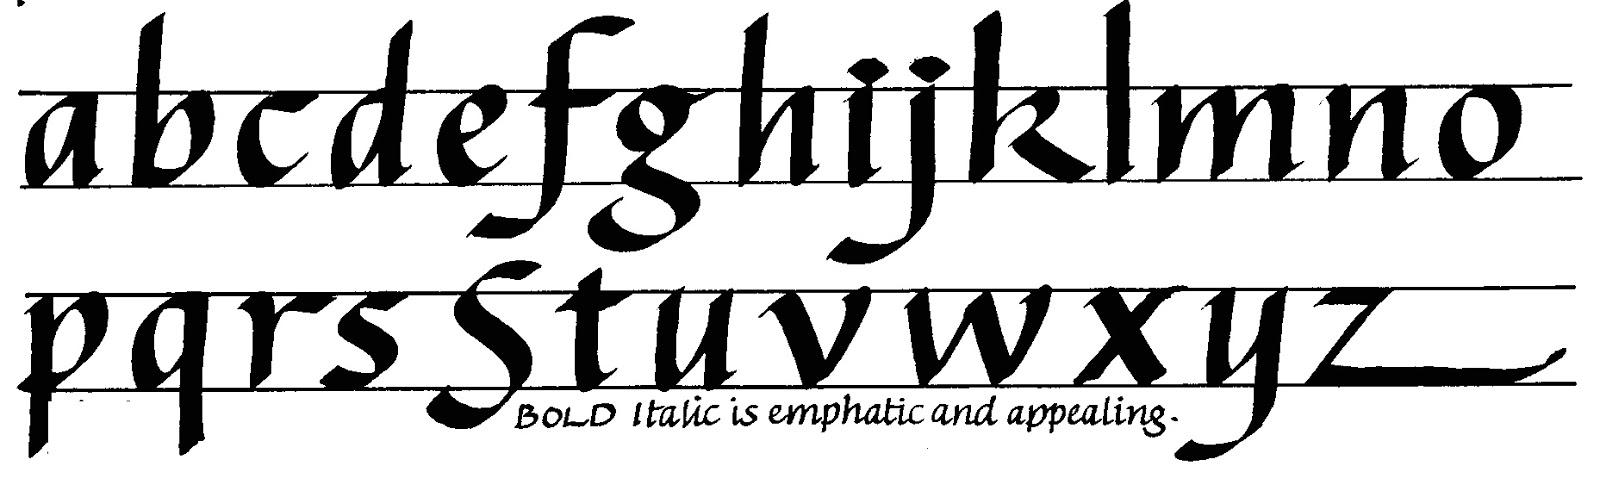 Margaret Shepherd Calligraphy Blog 189 Bold Italic